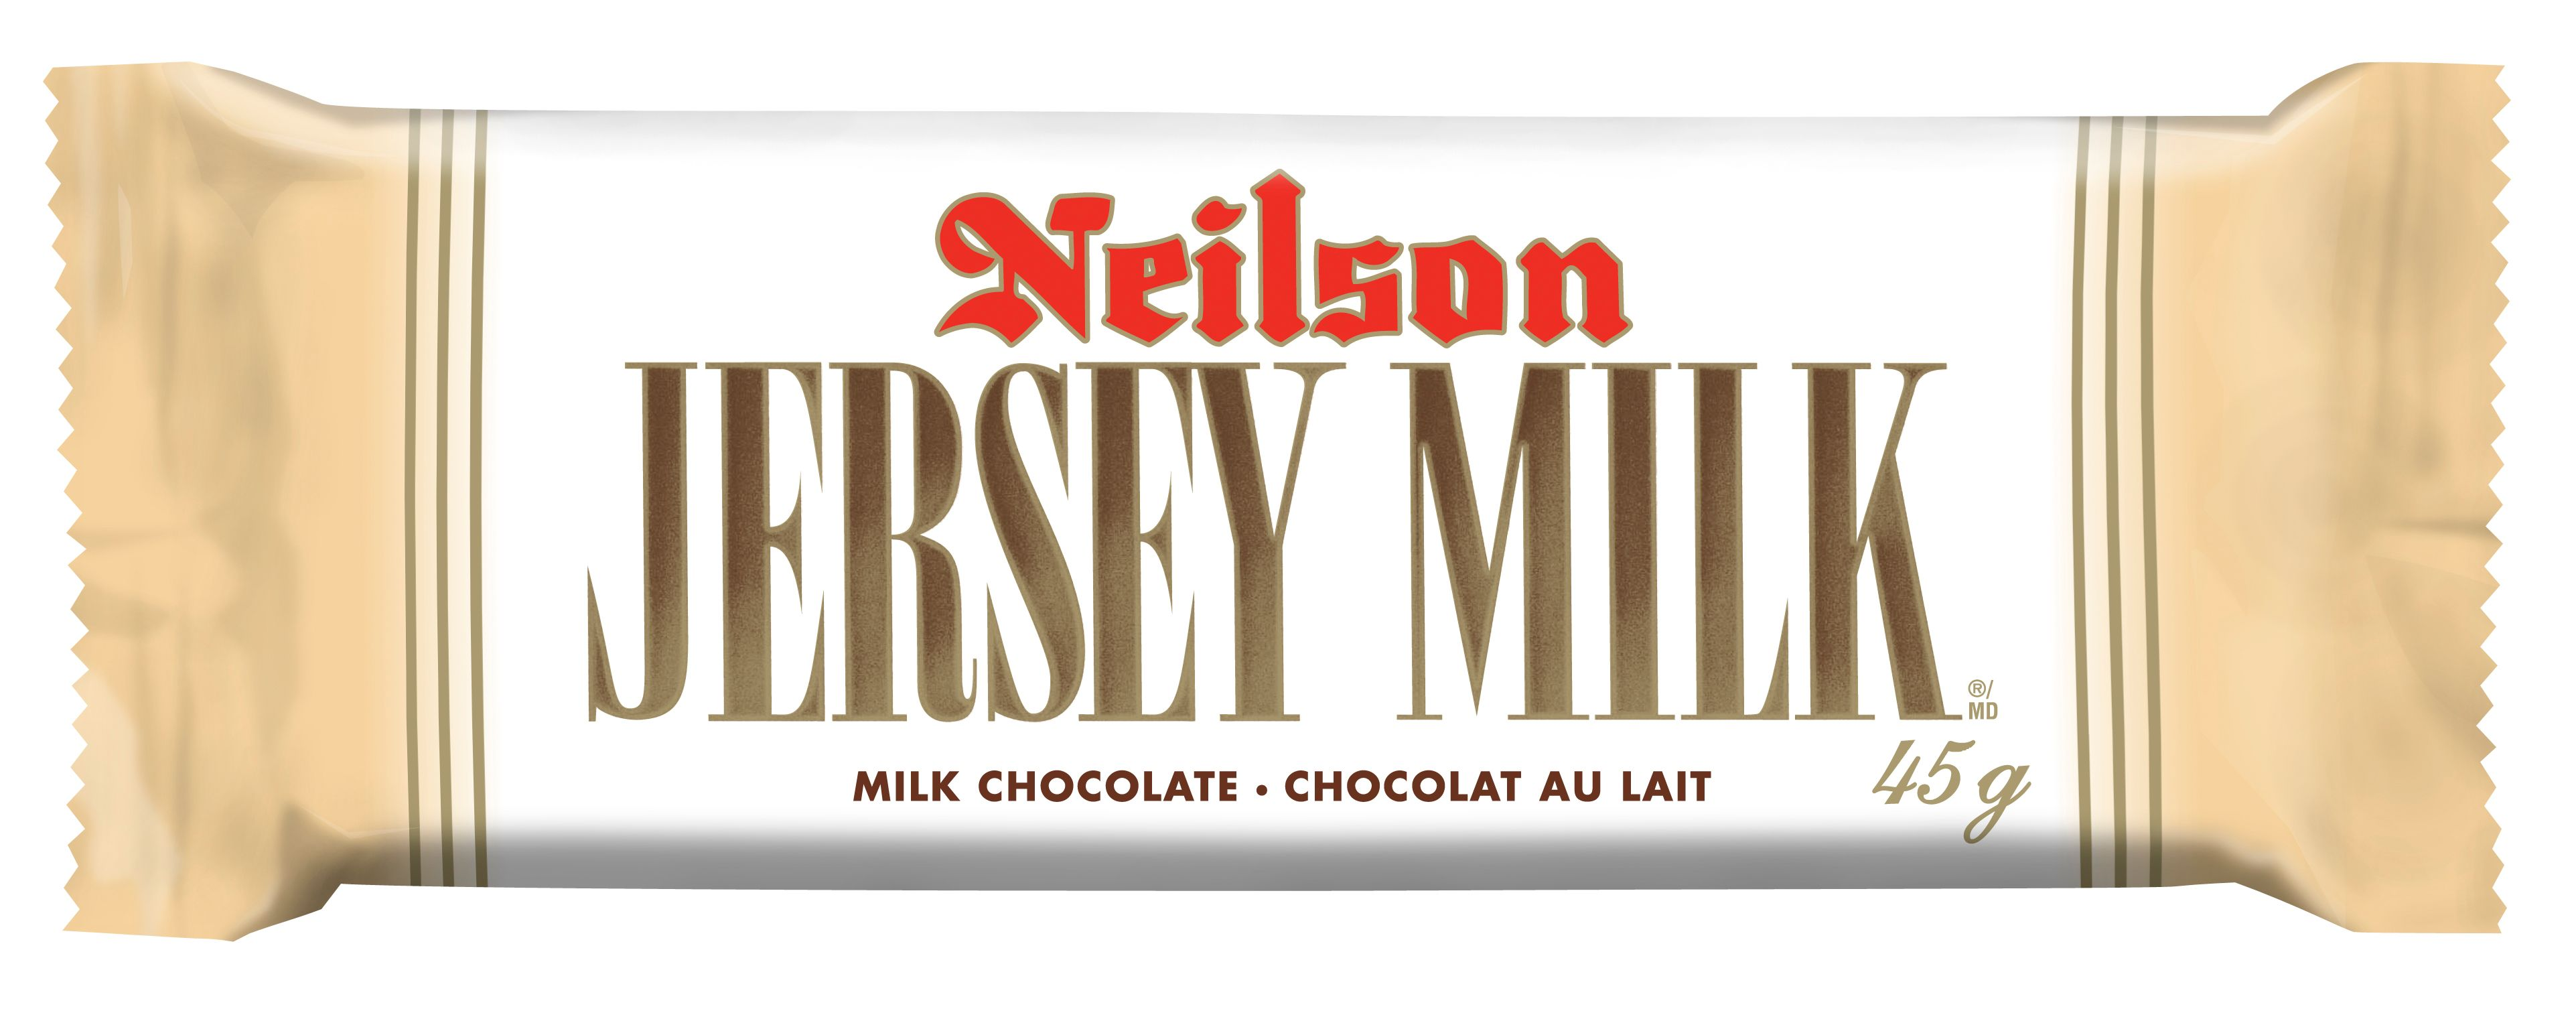 JERSEY MILK   45 GRM